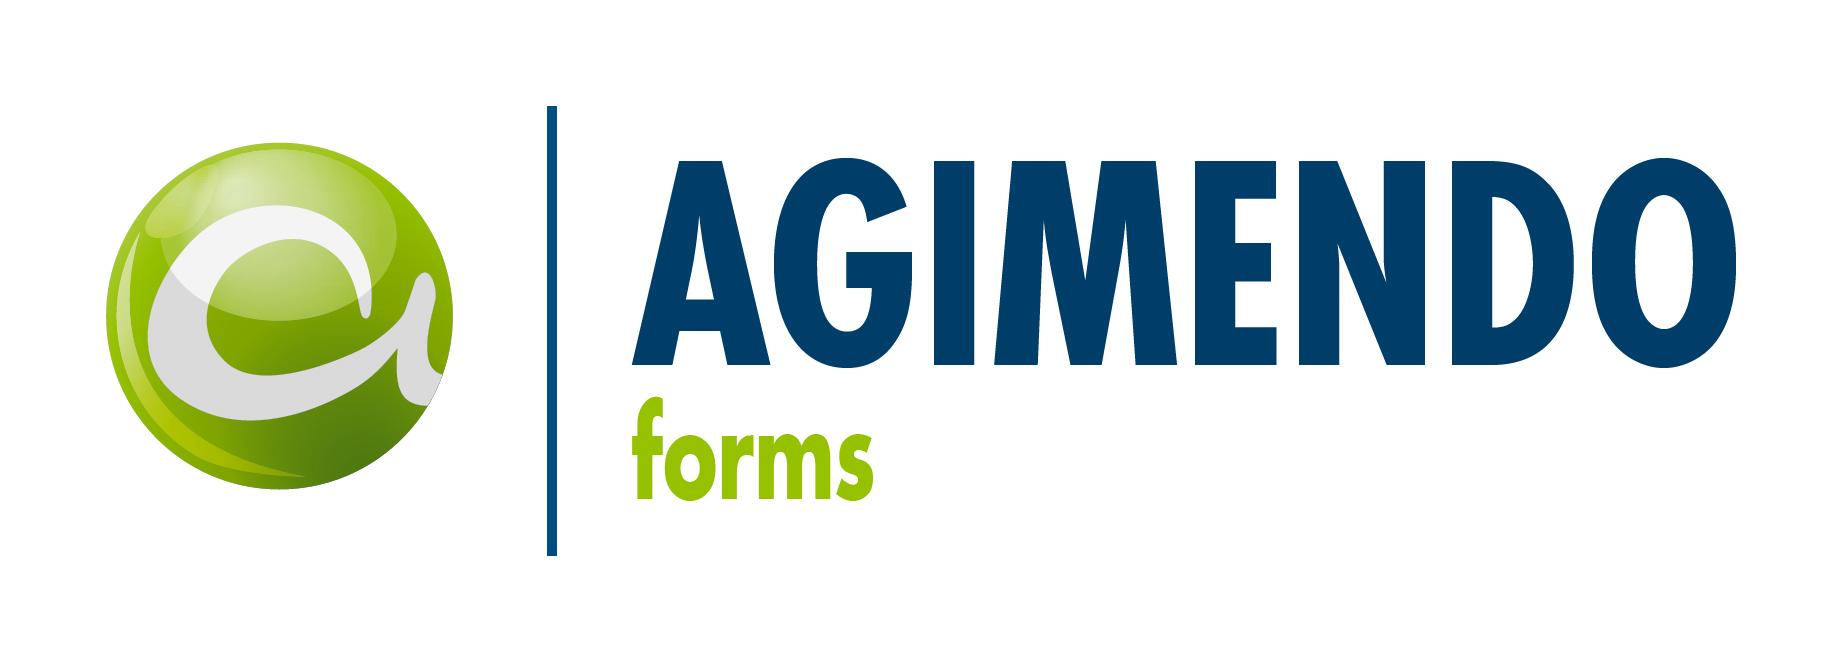 AGIMENDO.forms_small_frame-freigestellt